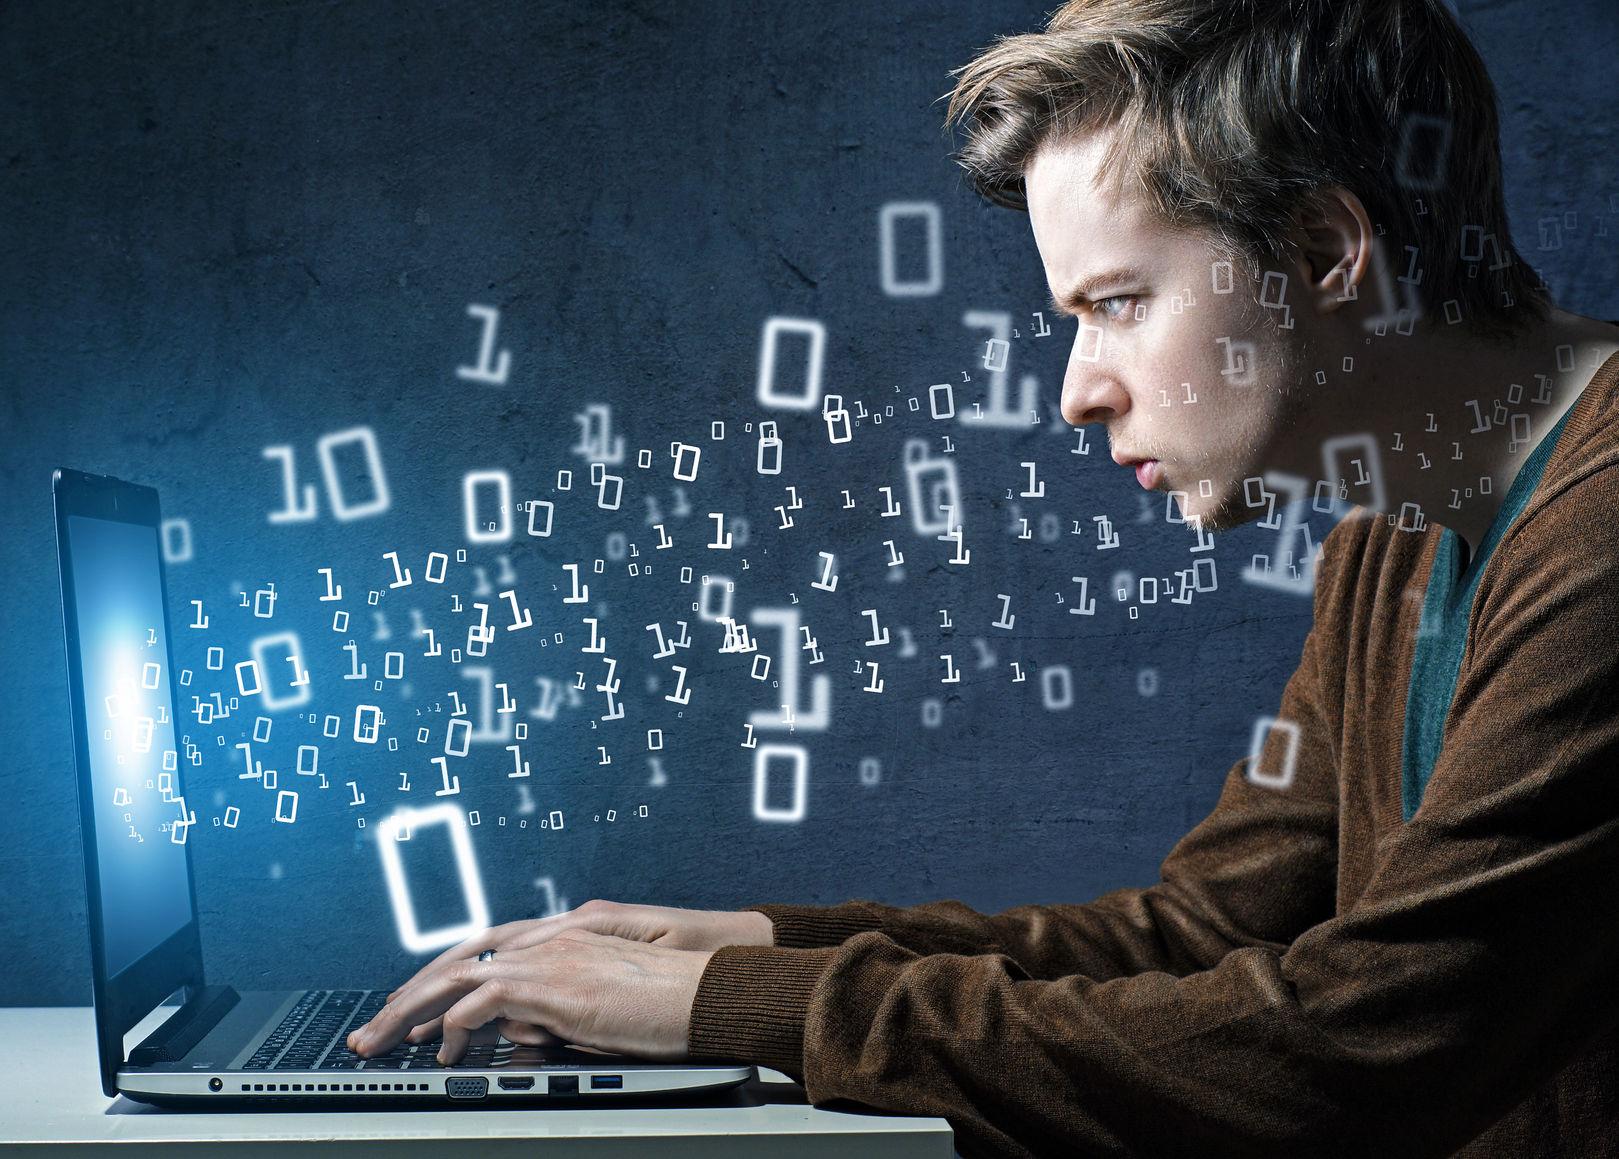 Sviluppatore di software